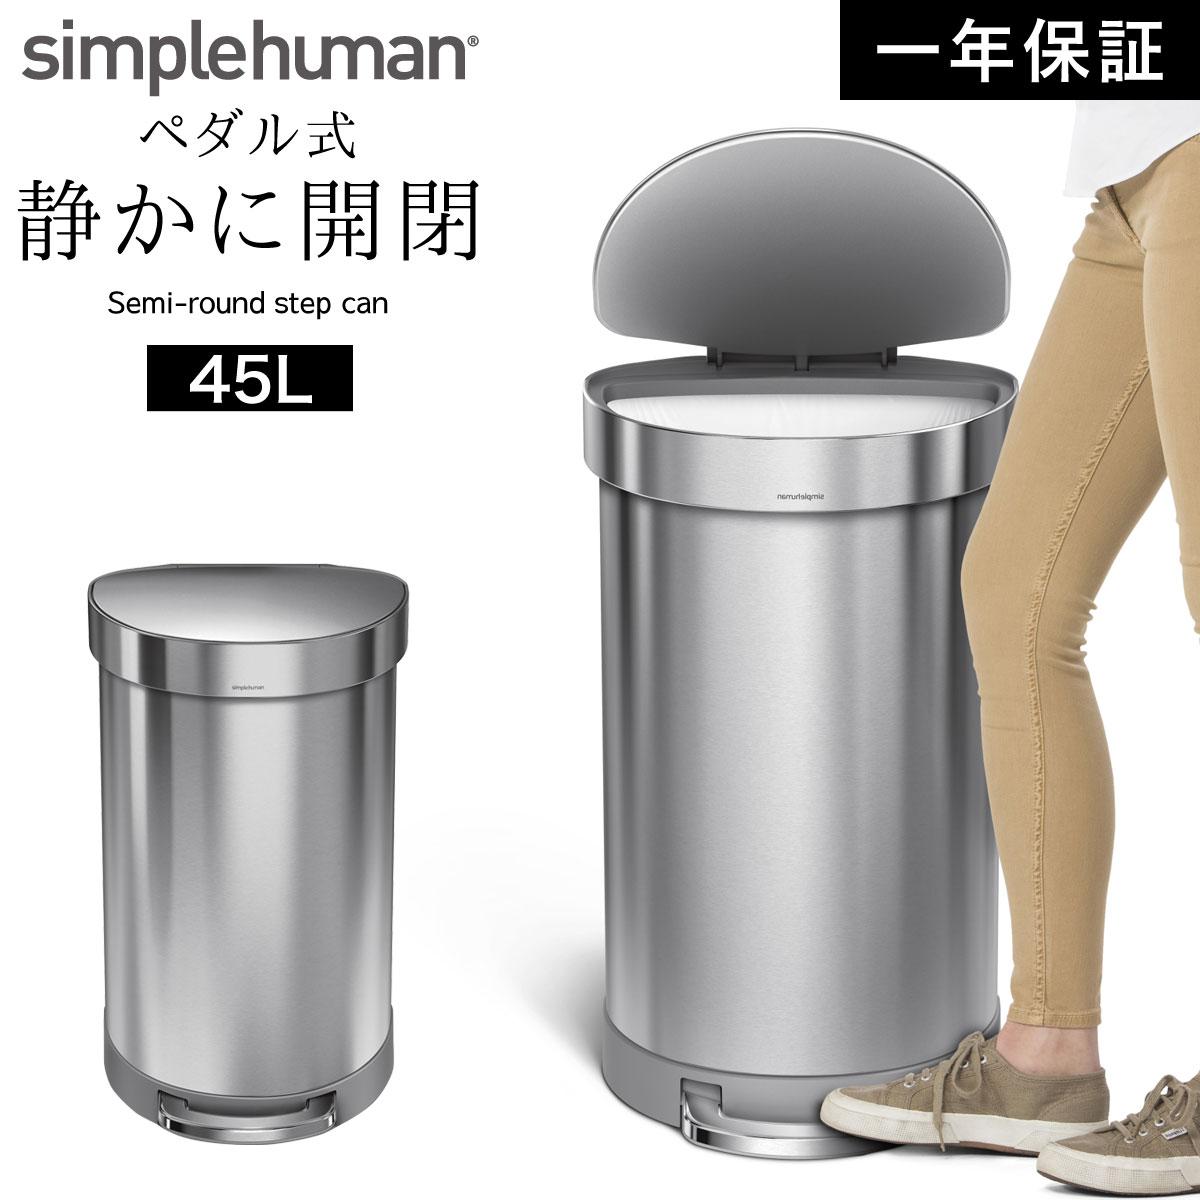 simplehuman シンプルヒューマン セミラウンドステップカン 45L 00124